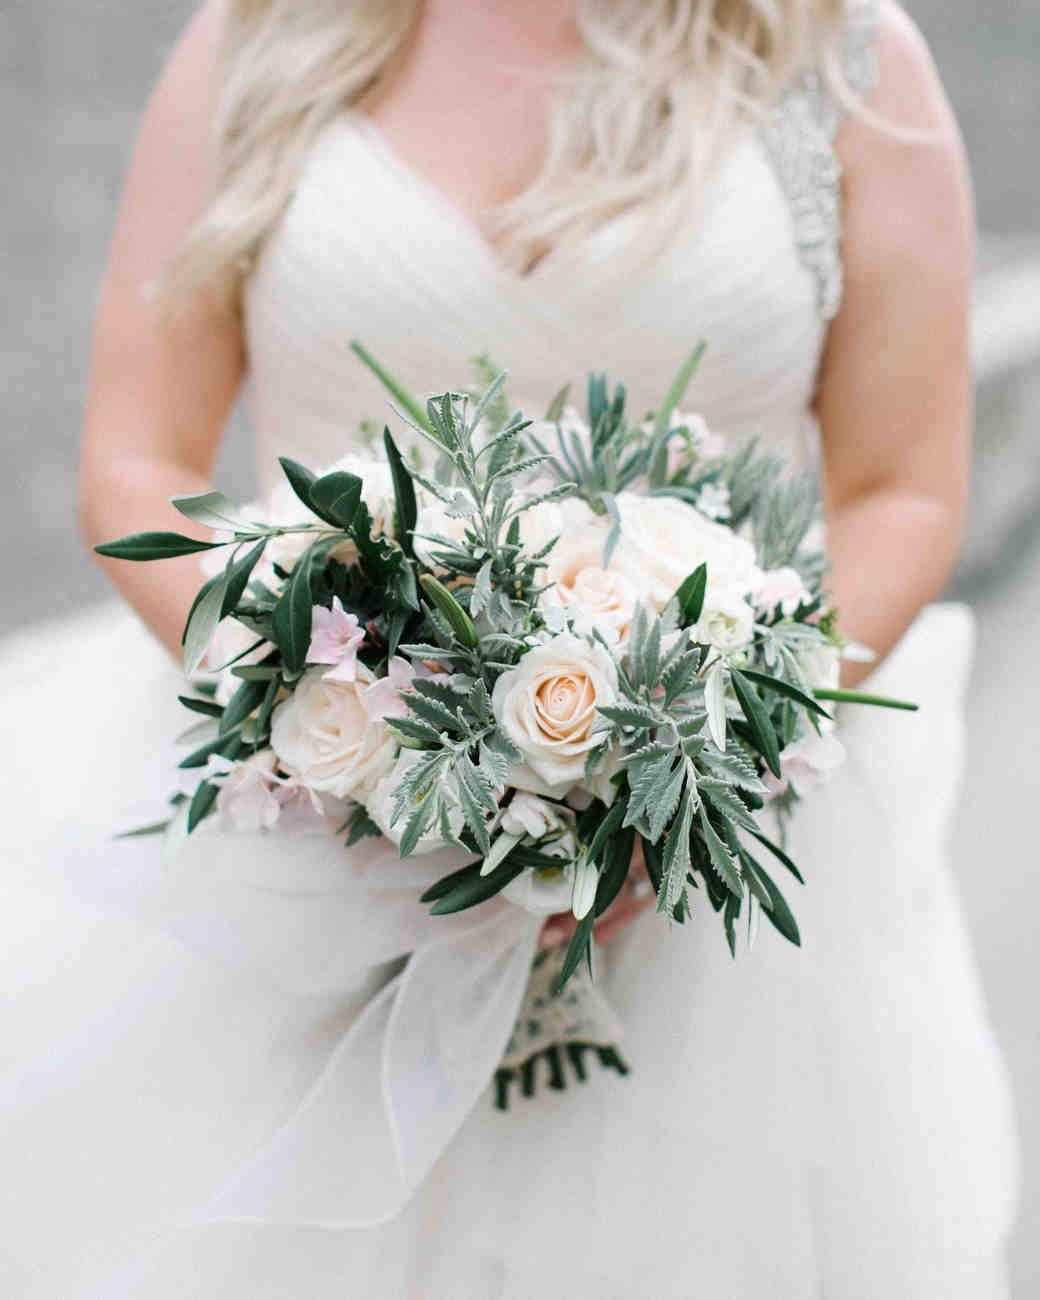 melissa-mike-wedding-bouquet-0135-s112764-0316.jpg